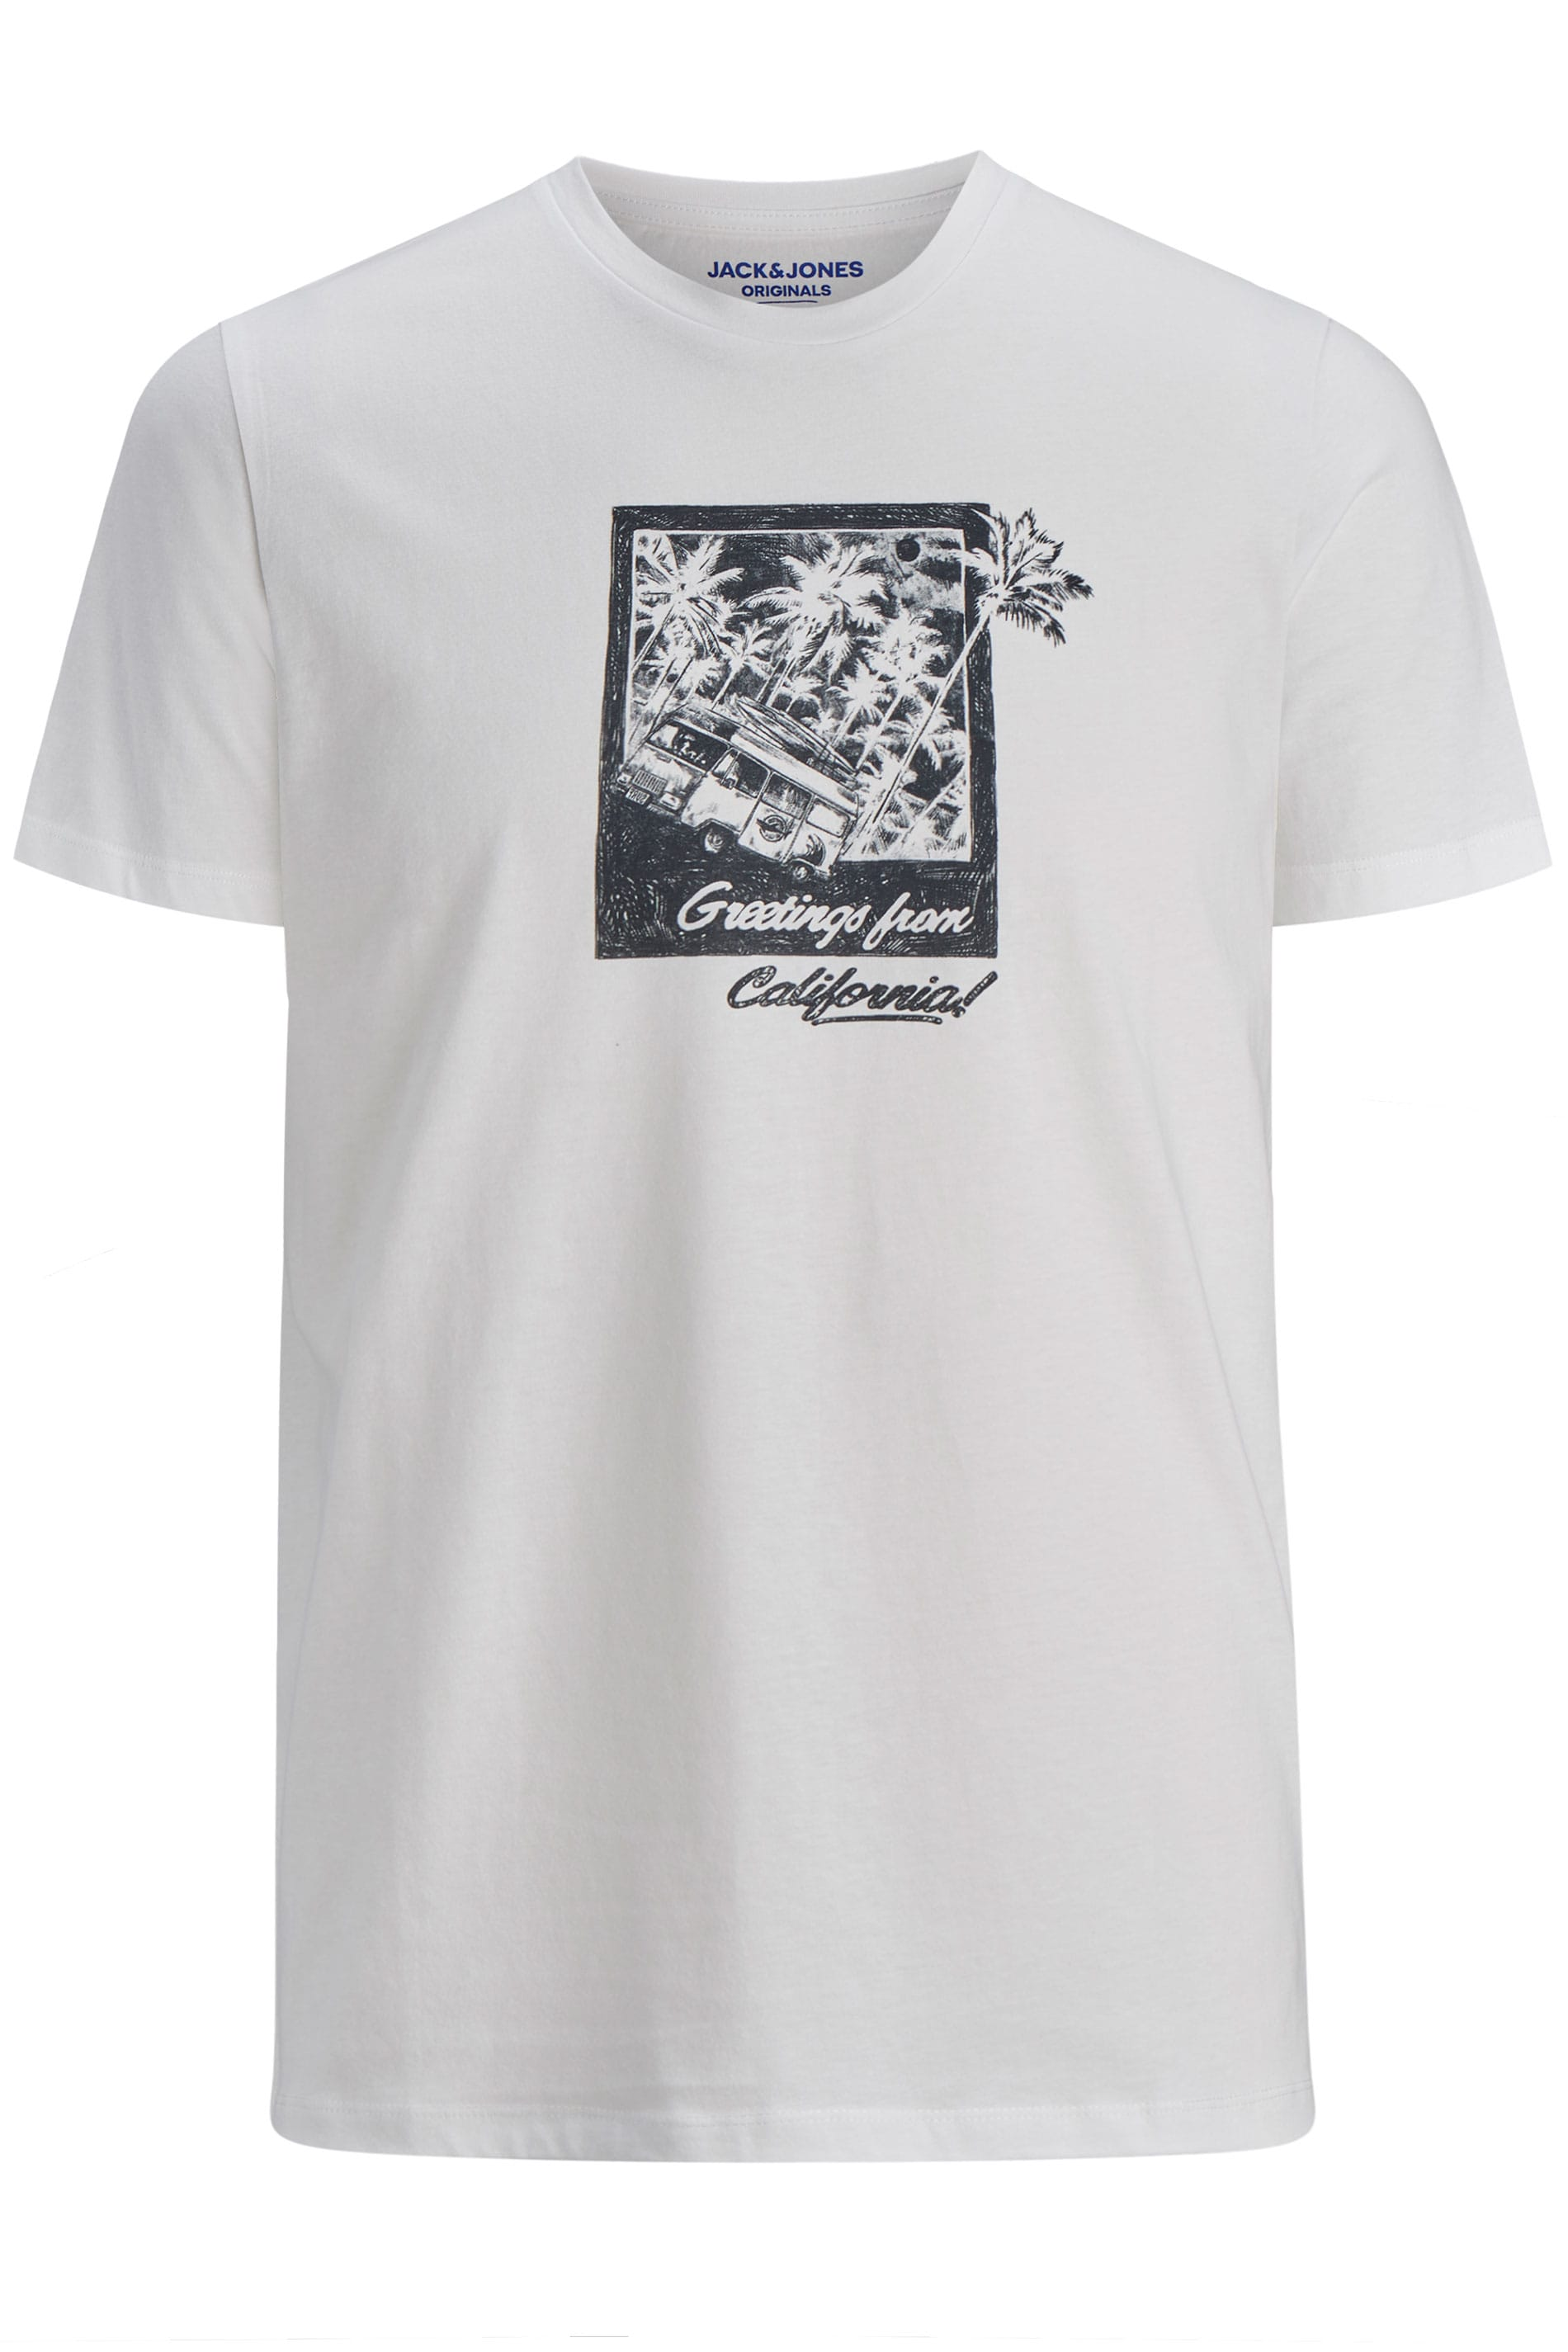 JACK & JONES White Postcard Graphic T-Shirt